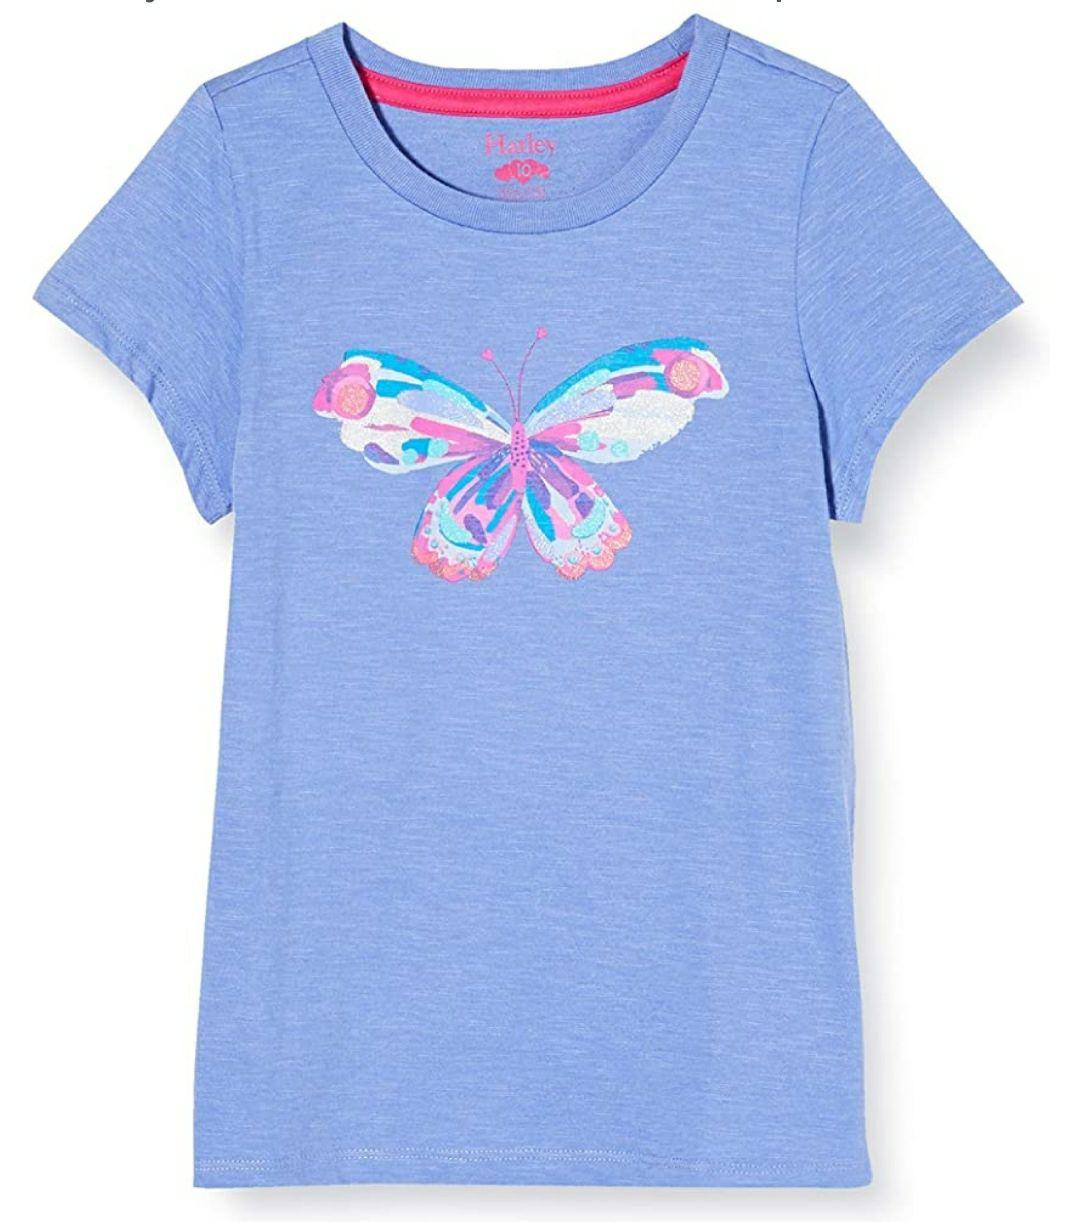 TALLA 5 Años - Hatley Short Sleeve T-Shirts Camiseta para Niñas. Color azul, mariposa